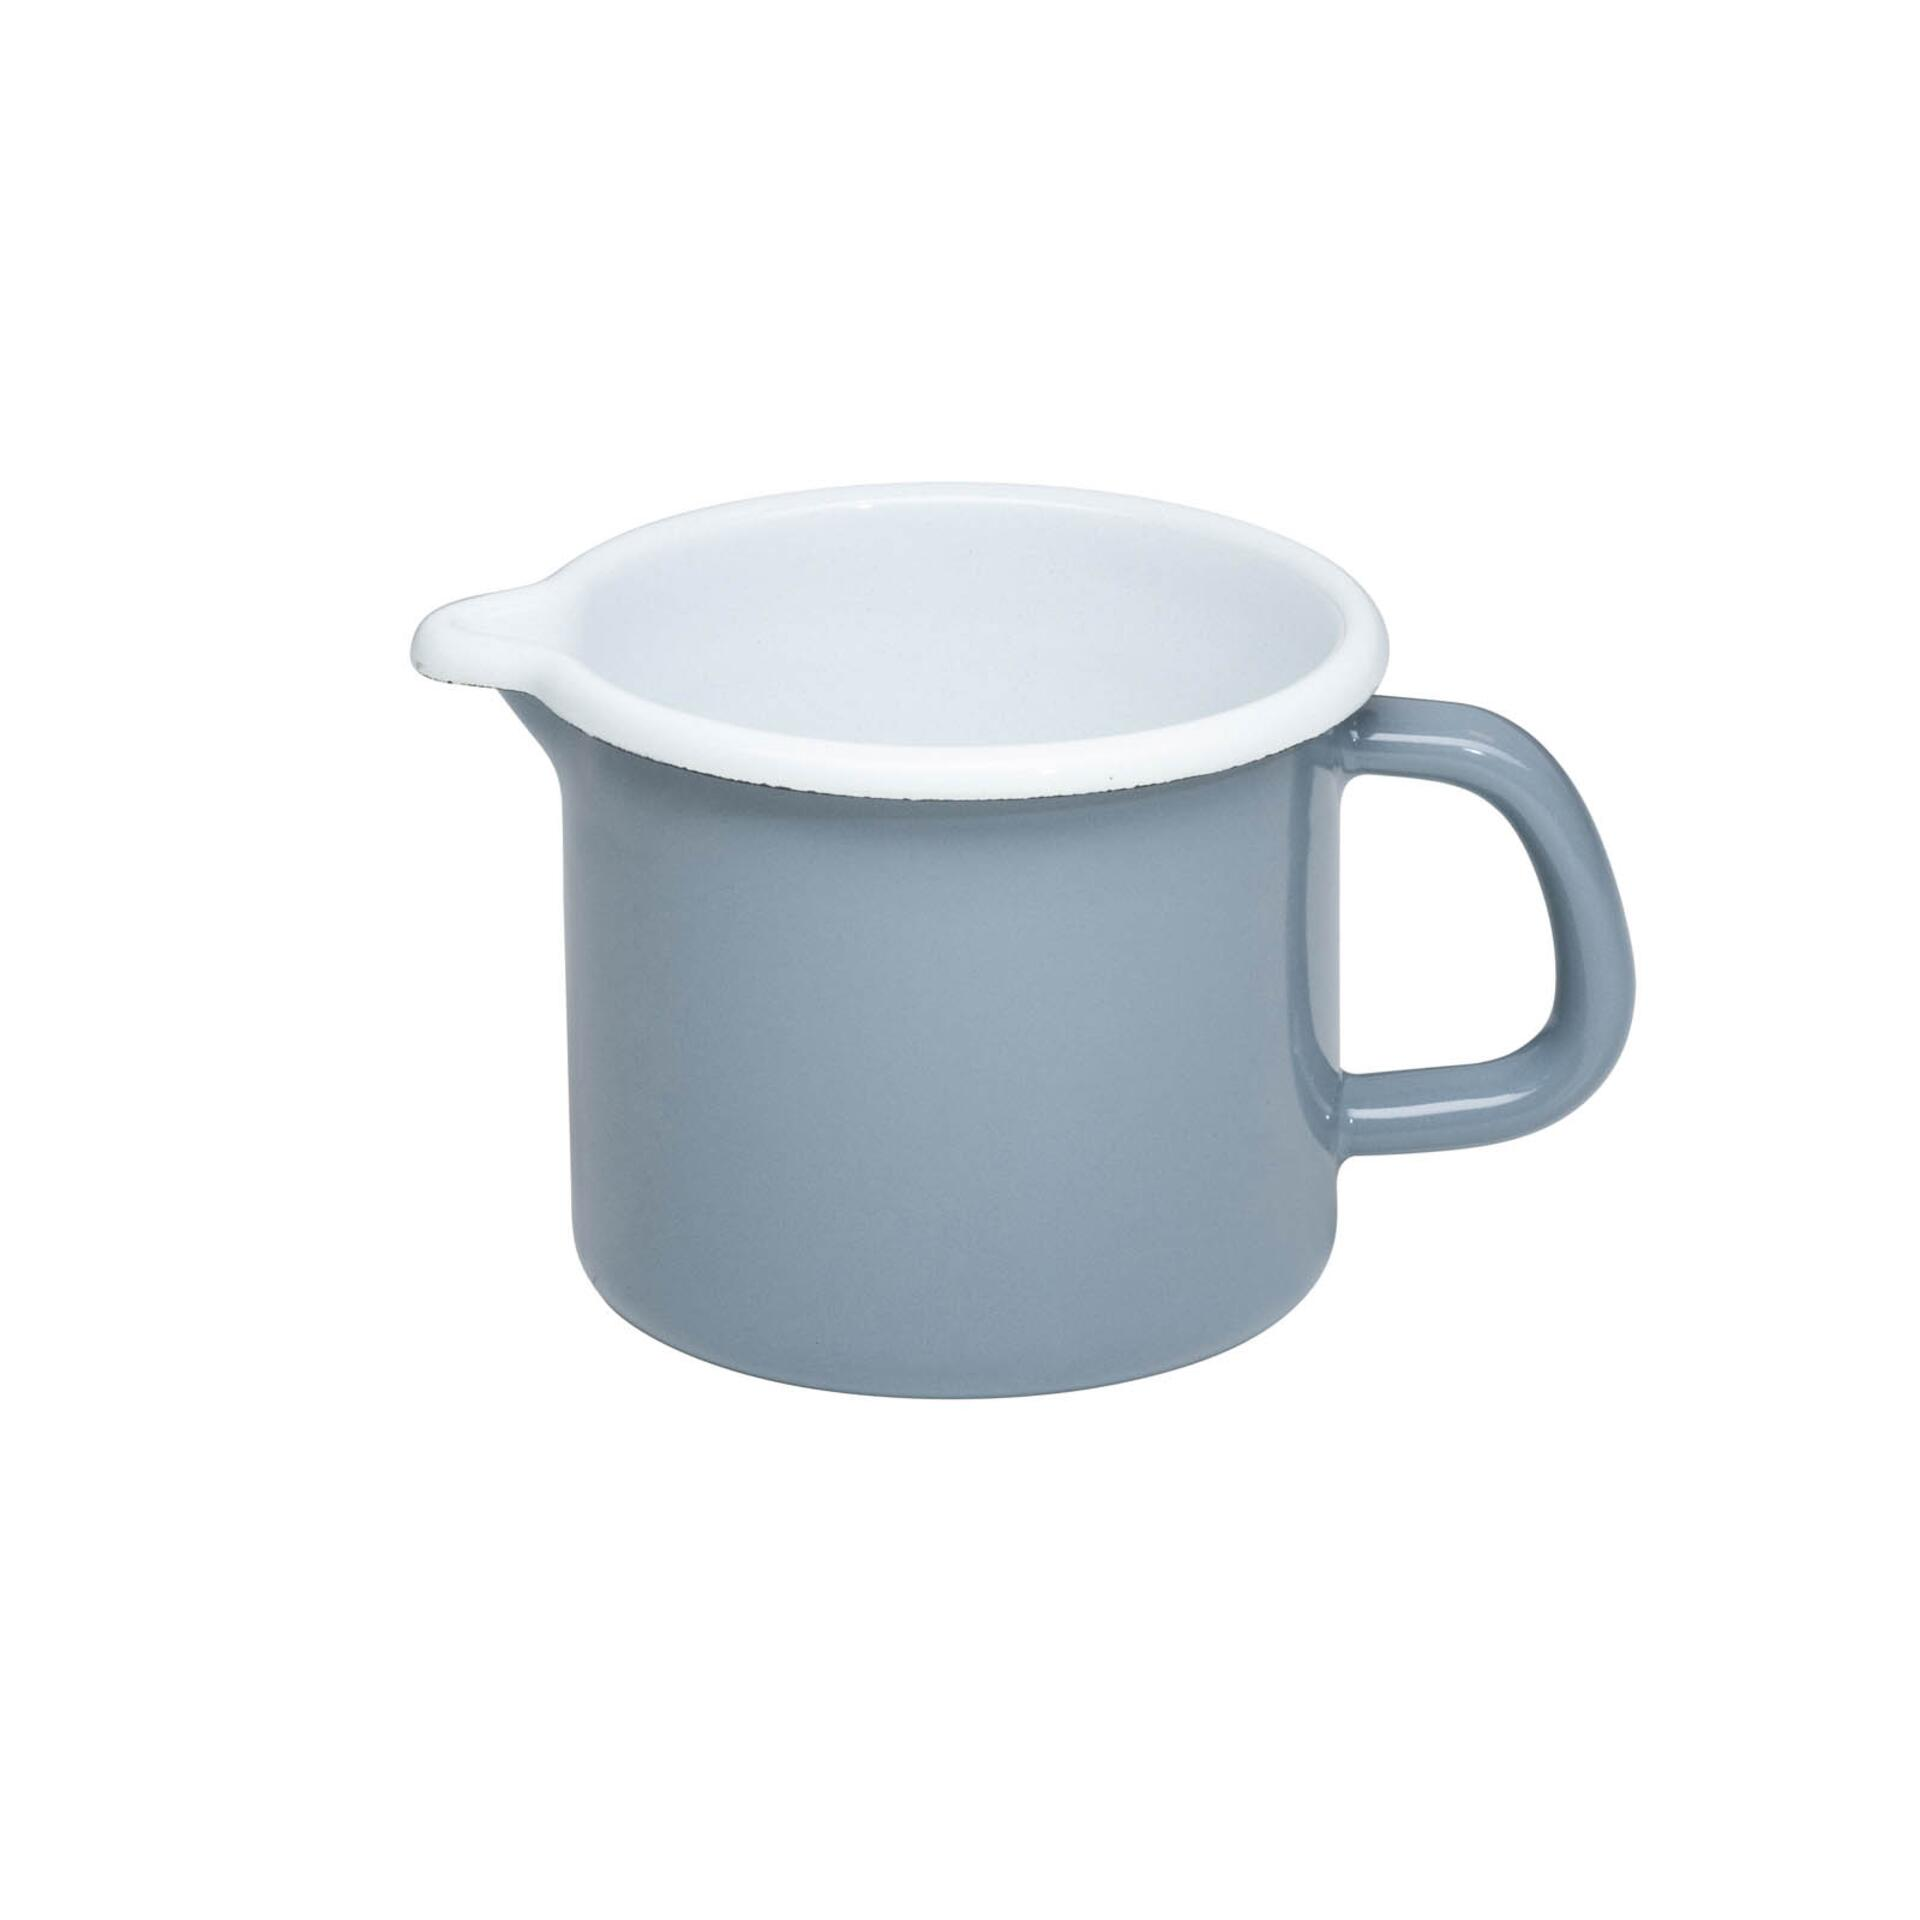 Riess Schnabeltopf 0,5 l Pure Grey